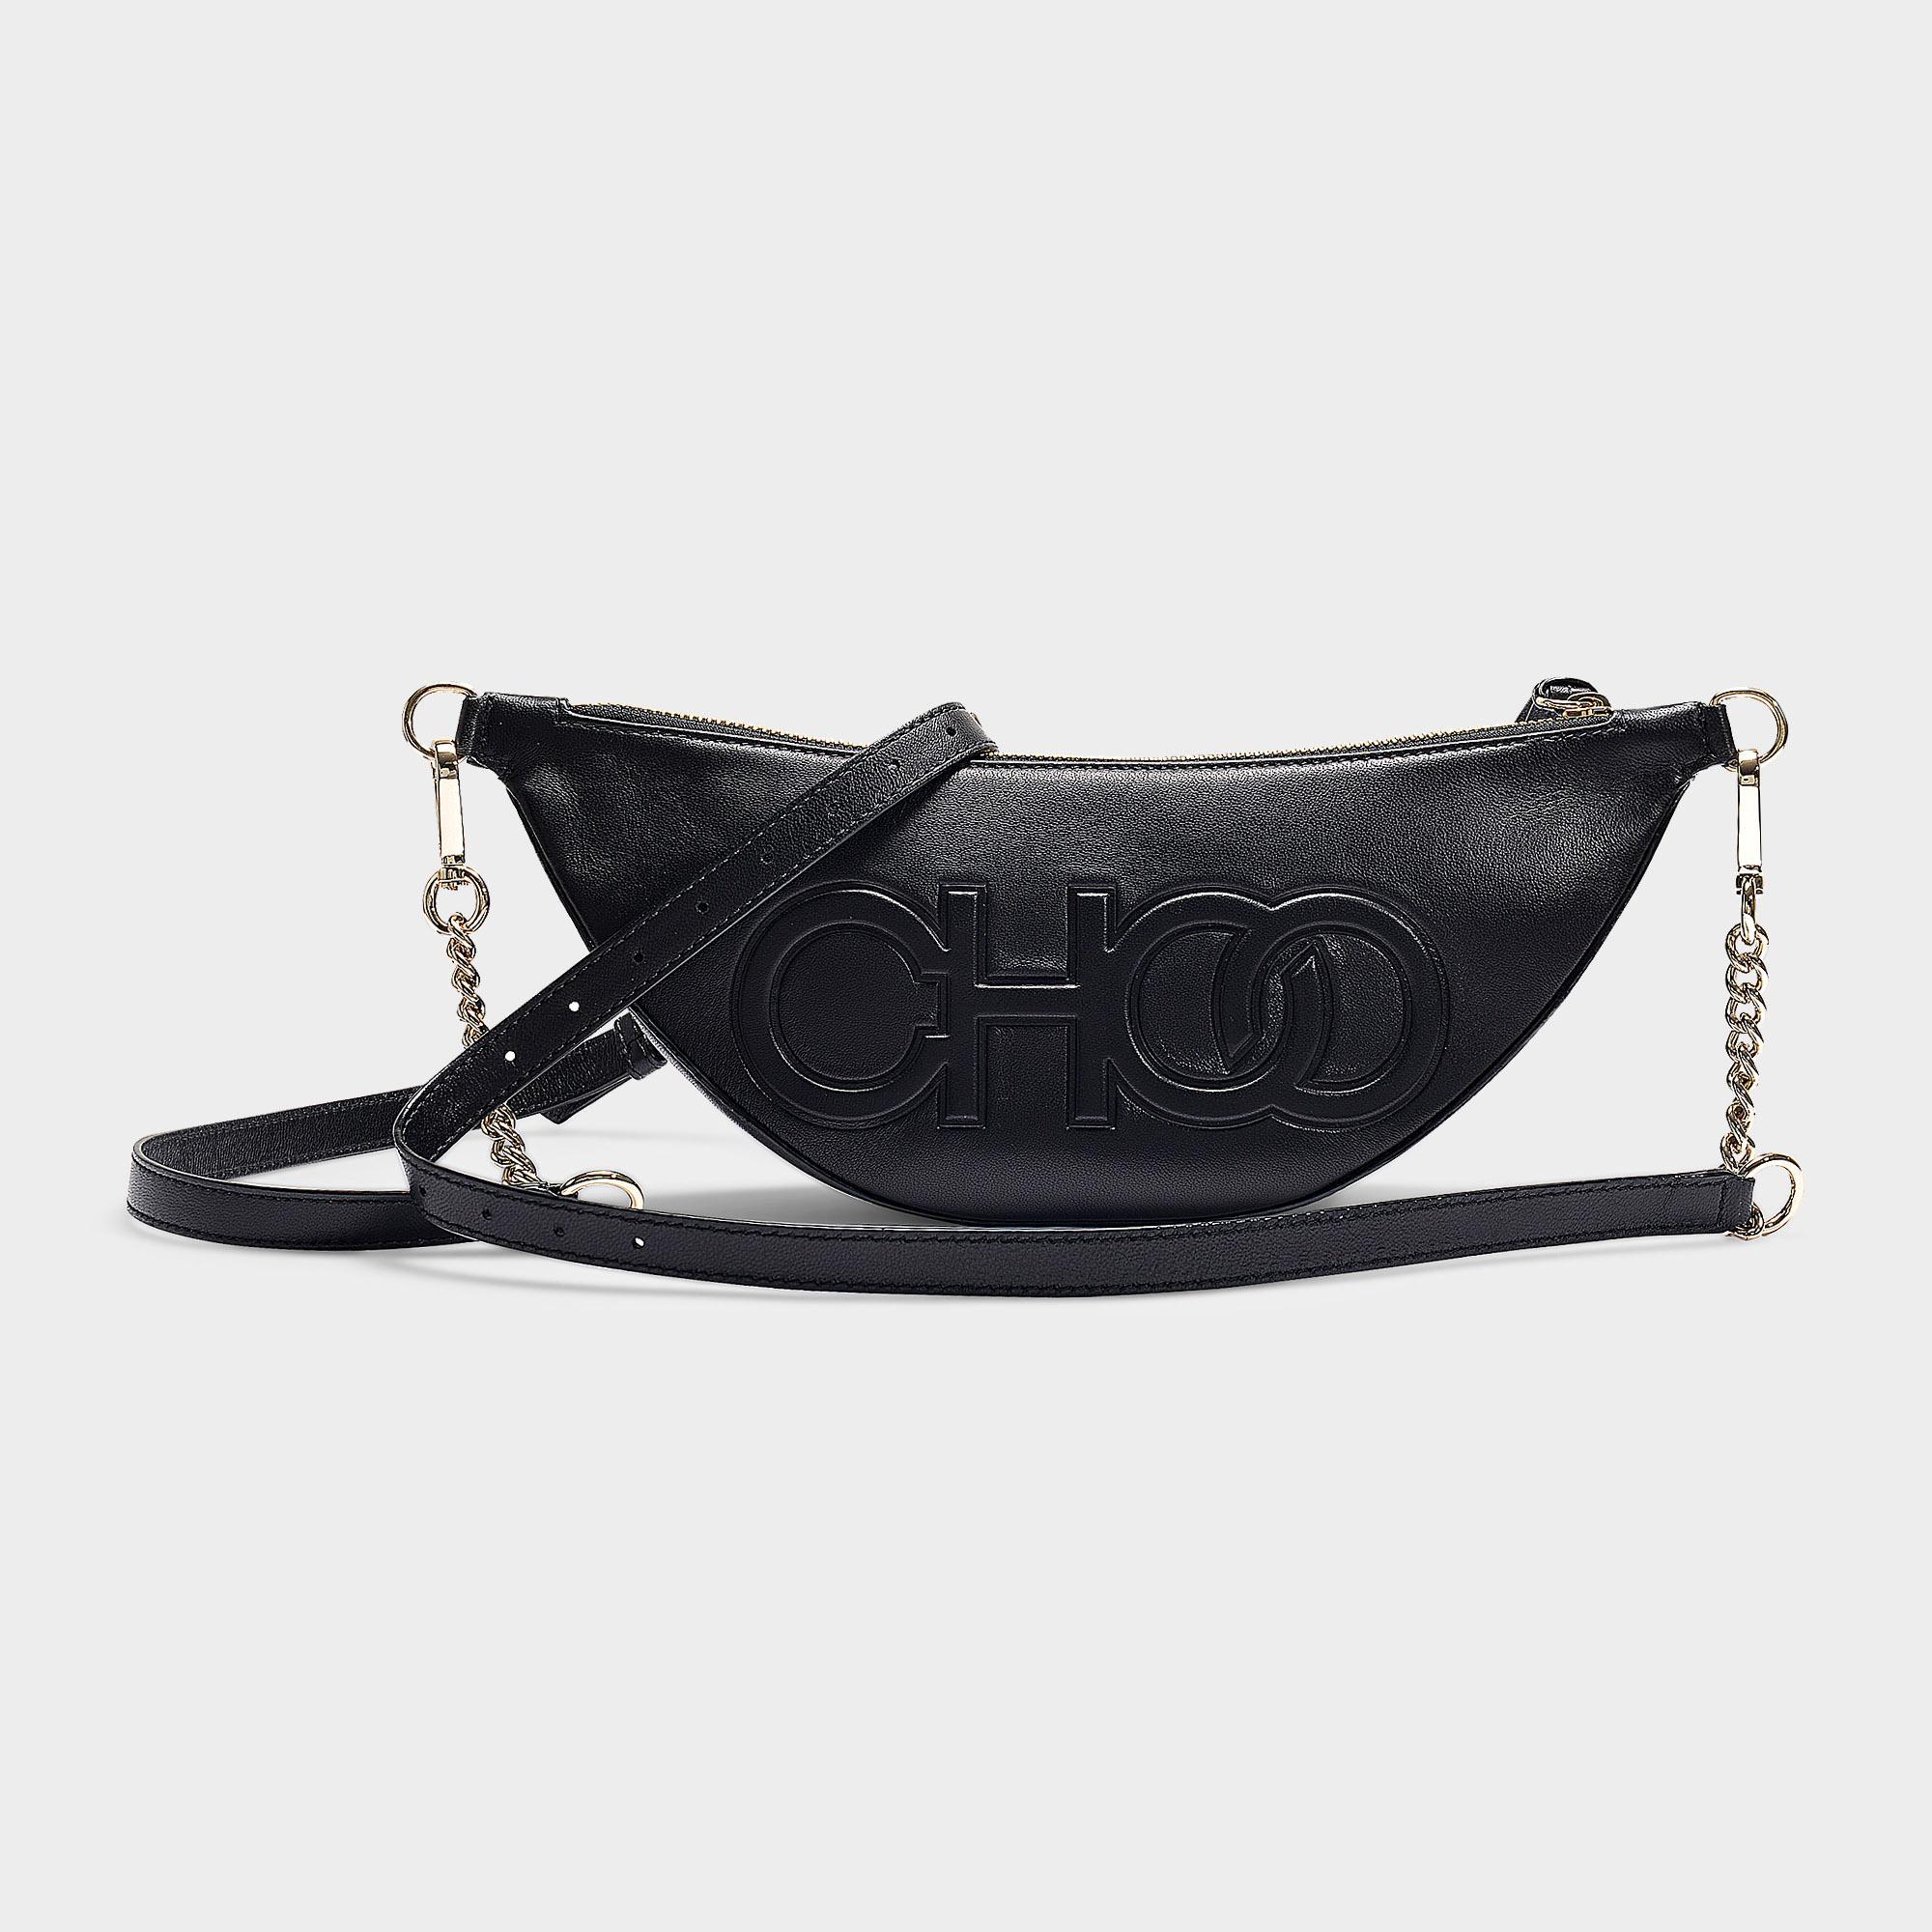 69258b71d Jimmy Choo Faye Shoulder Bag In Black Nappa Leather With Embossed Choo Logo  in Black - Save 50% - Lyst